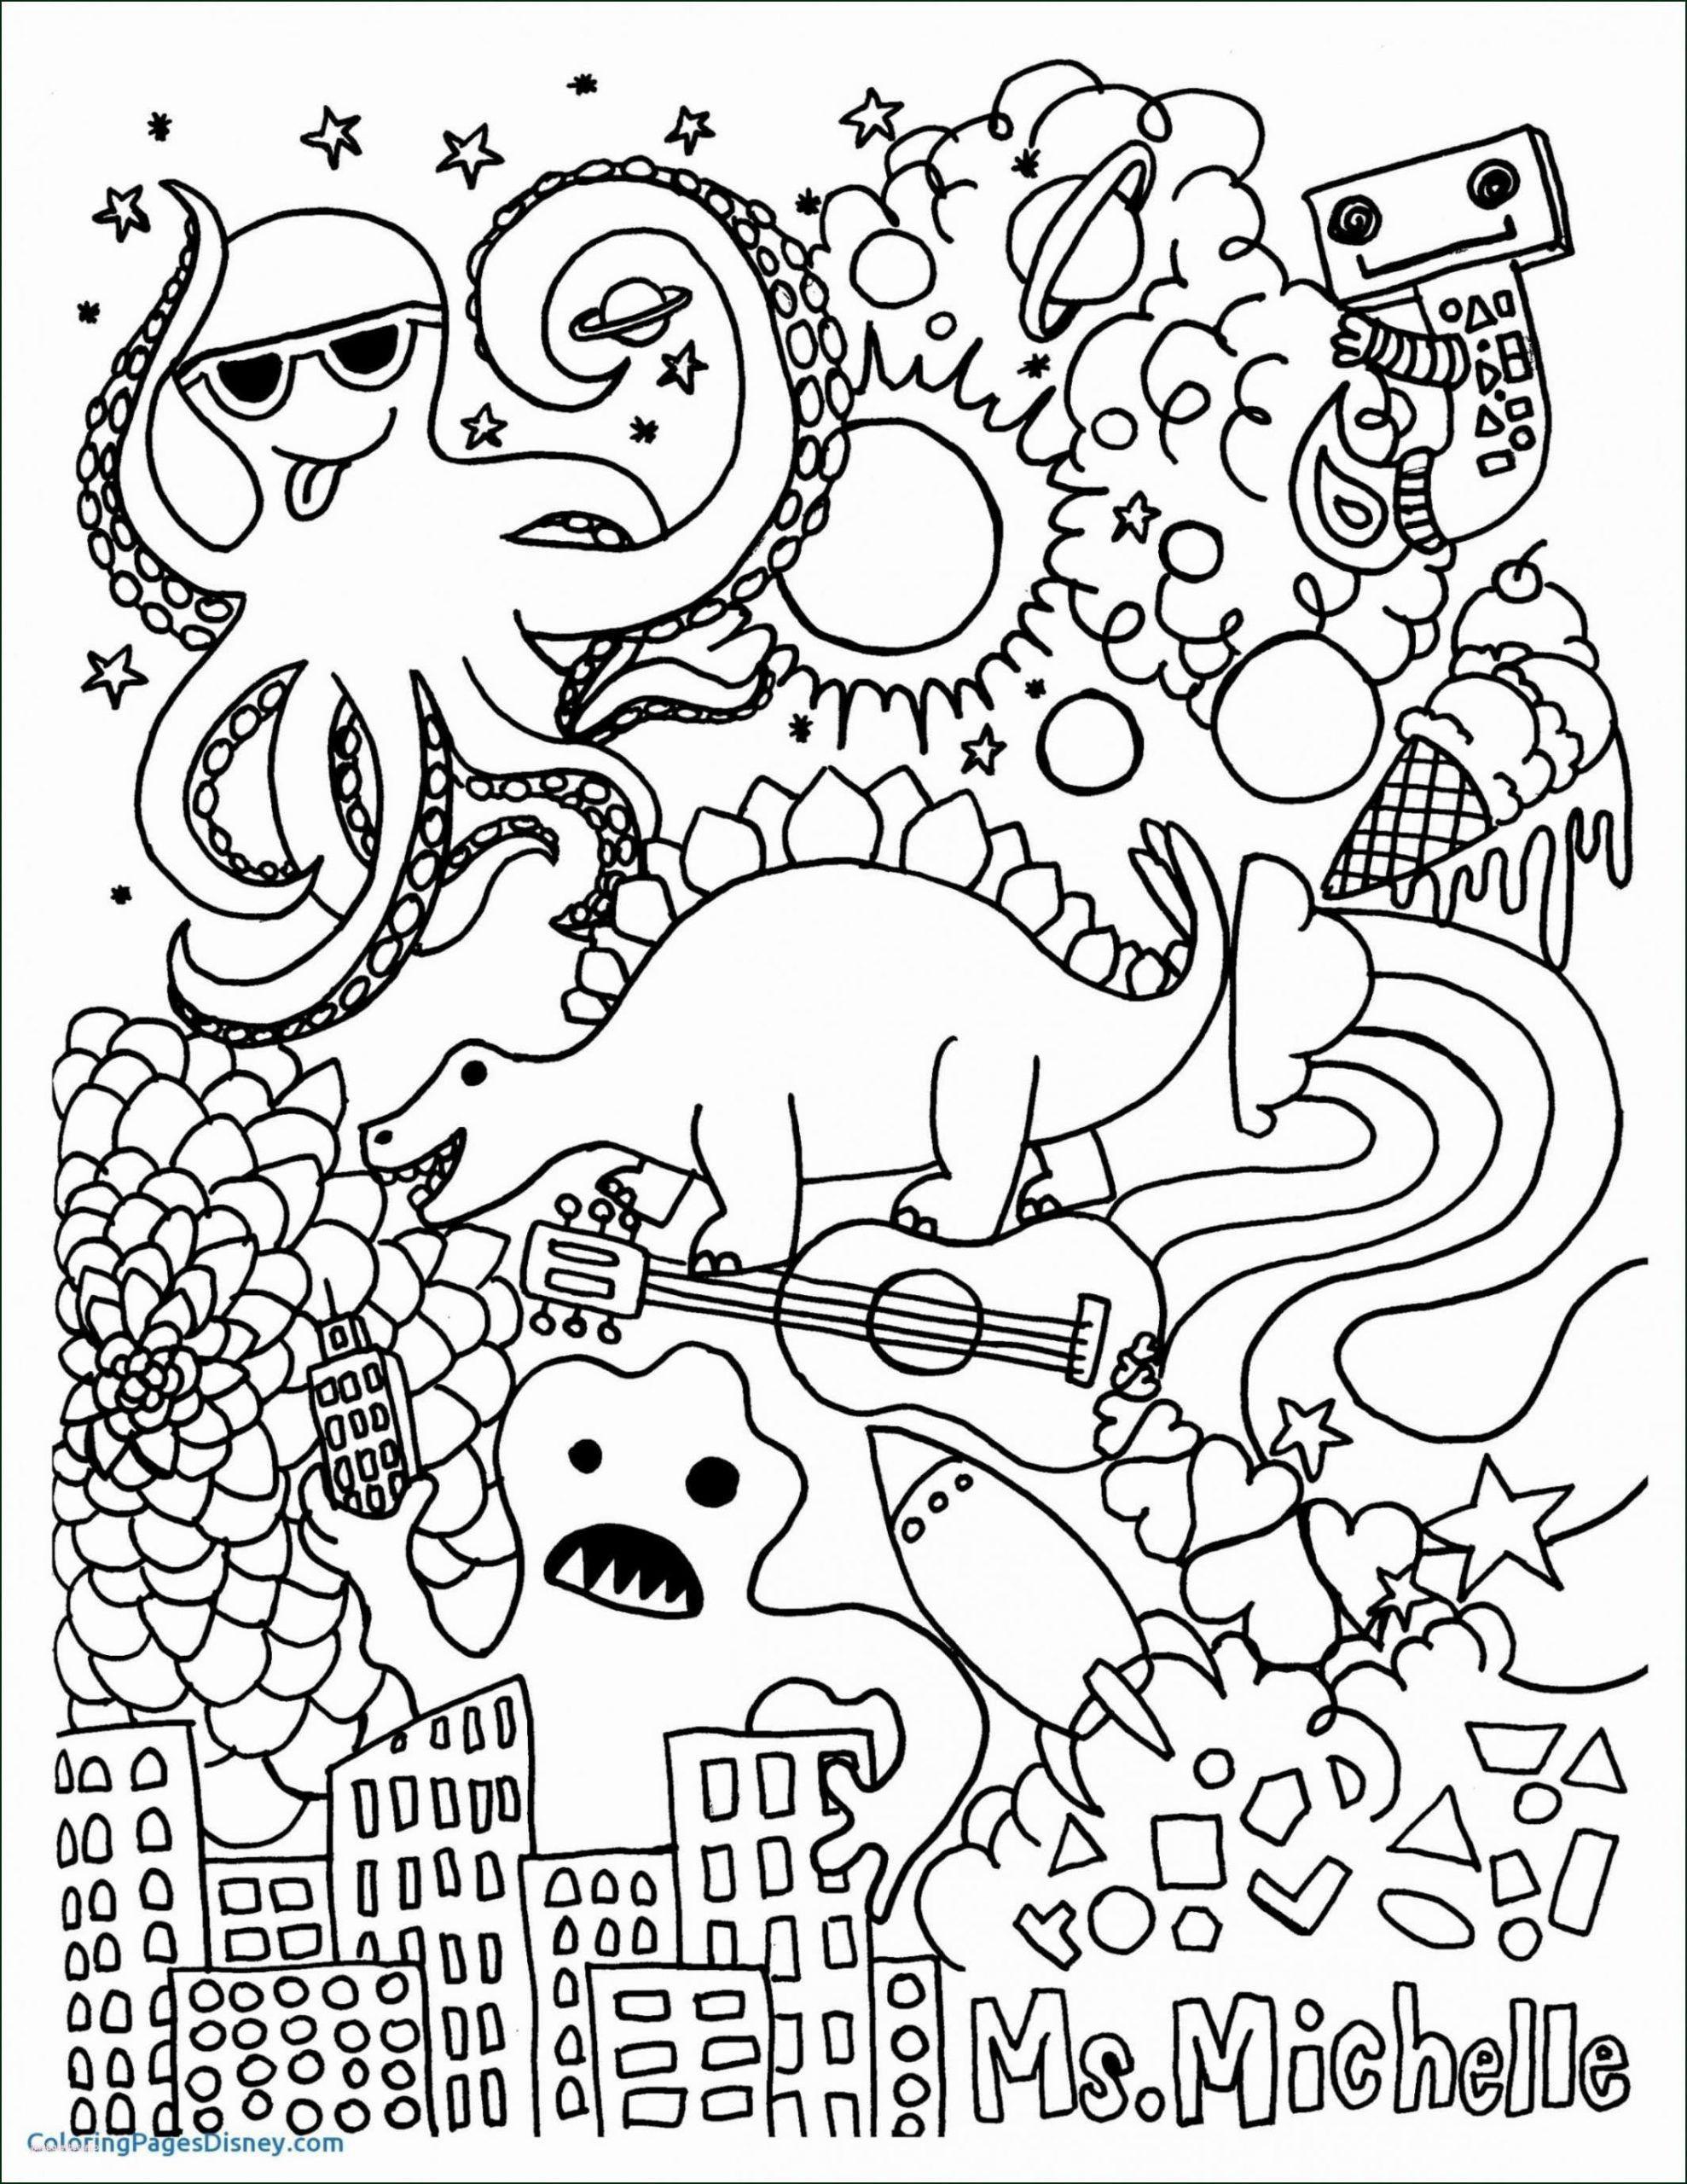 4 Worksheet Free Printable Coloring Sheets For Children